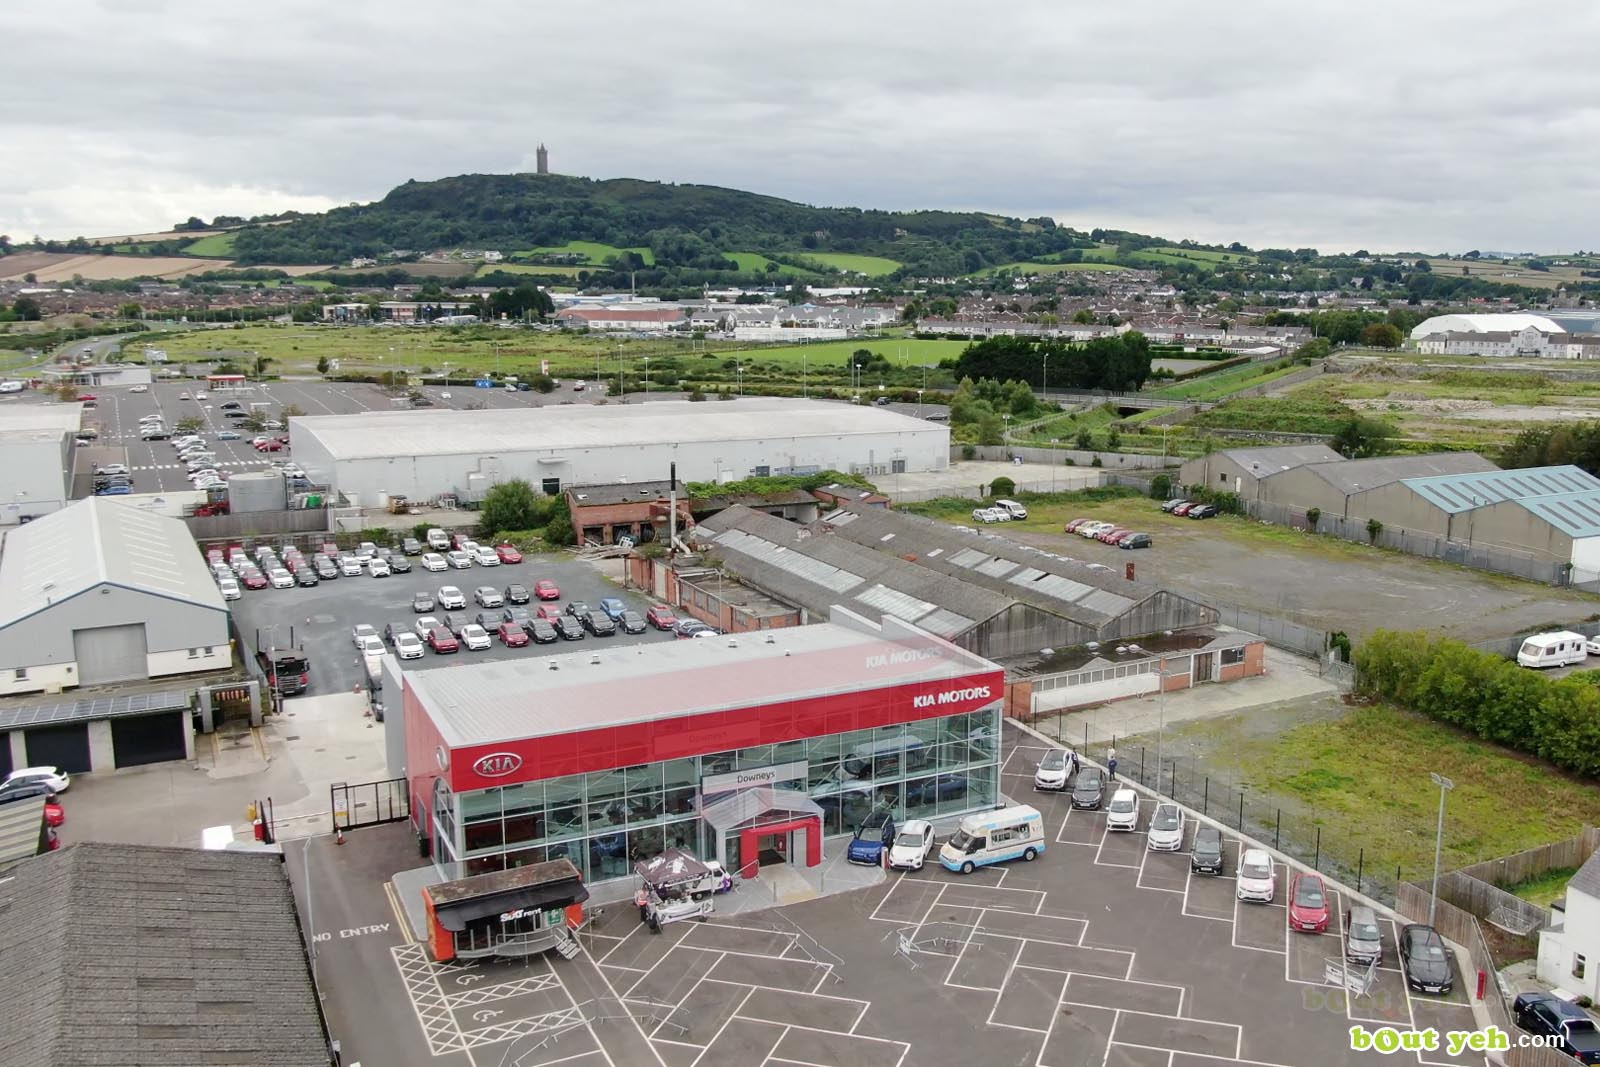 Aerial drone photography of Kia Cars Newtownabbey by Bout Yeh aerial drone photographers, Belfast, Northern Ireland - screenshot 1